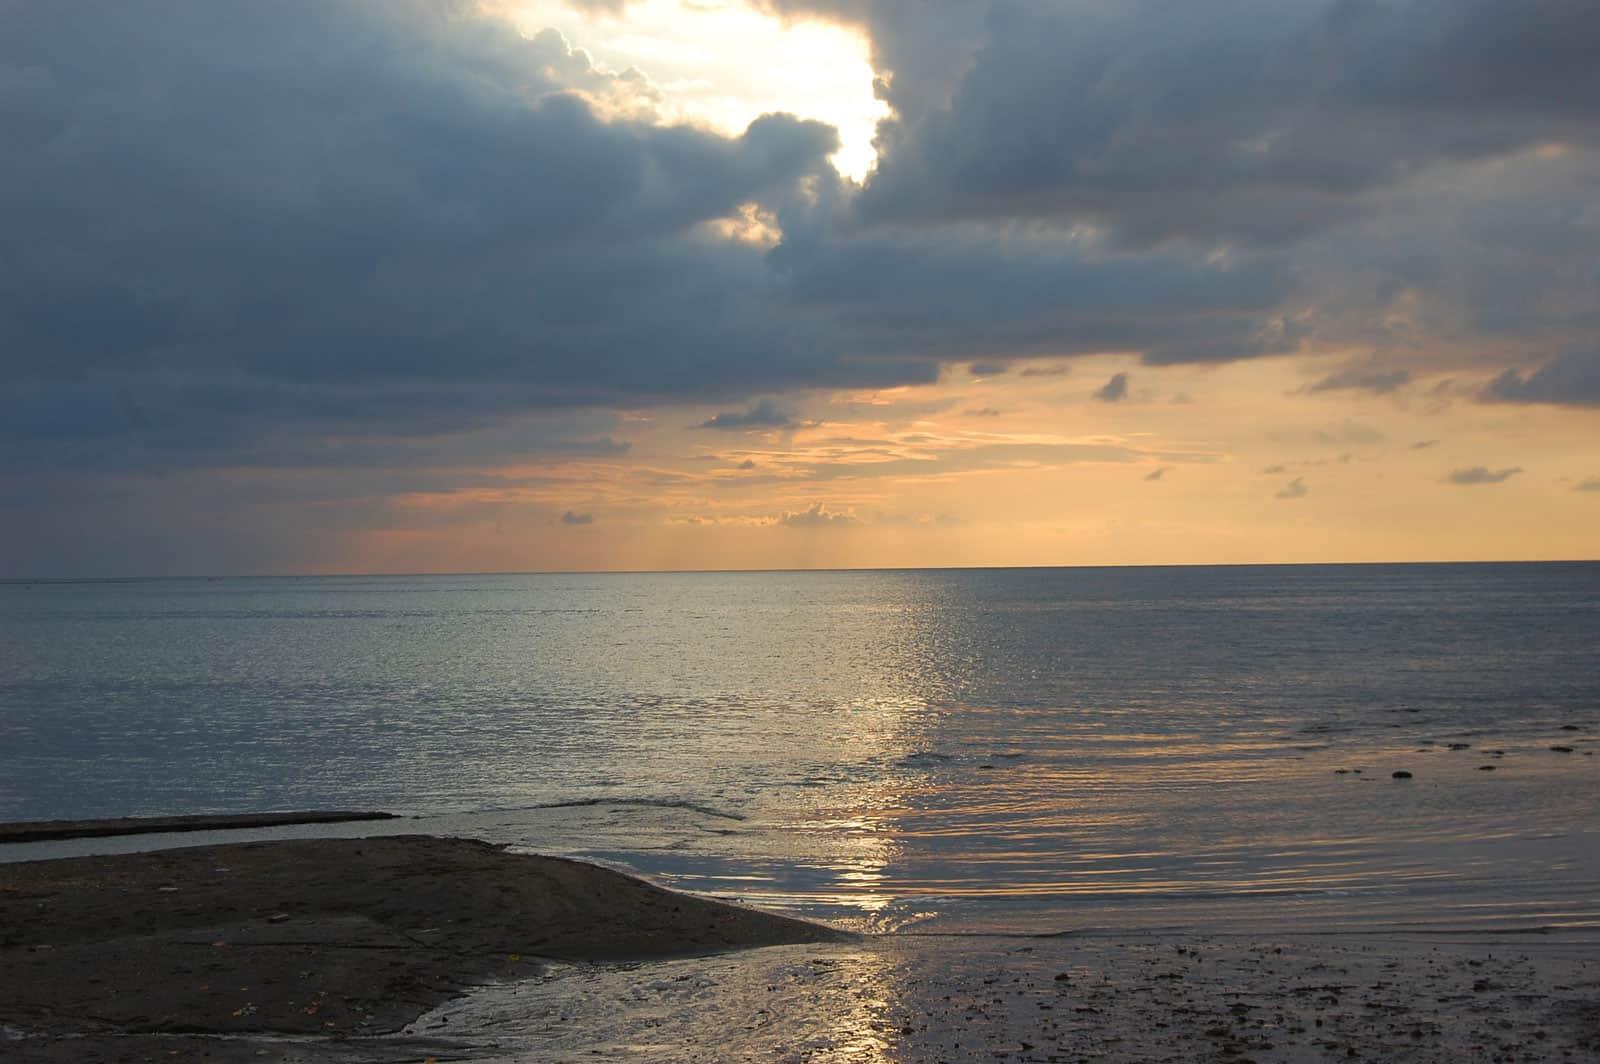 Sunset at Lovina Beach in Bali, Indonesia